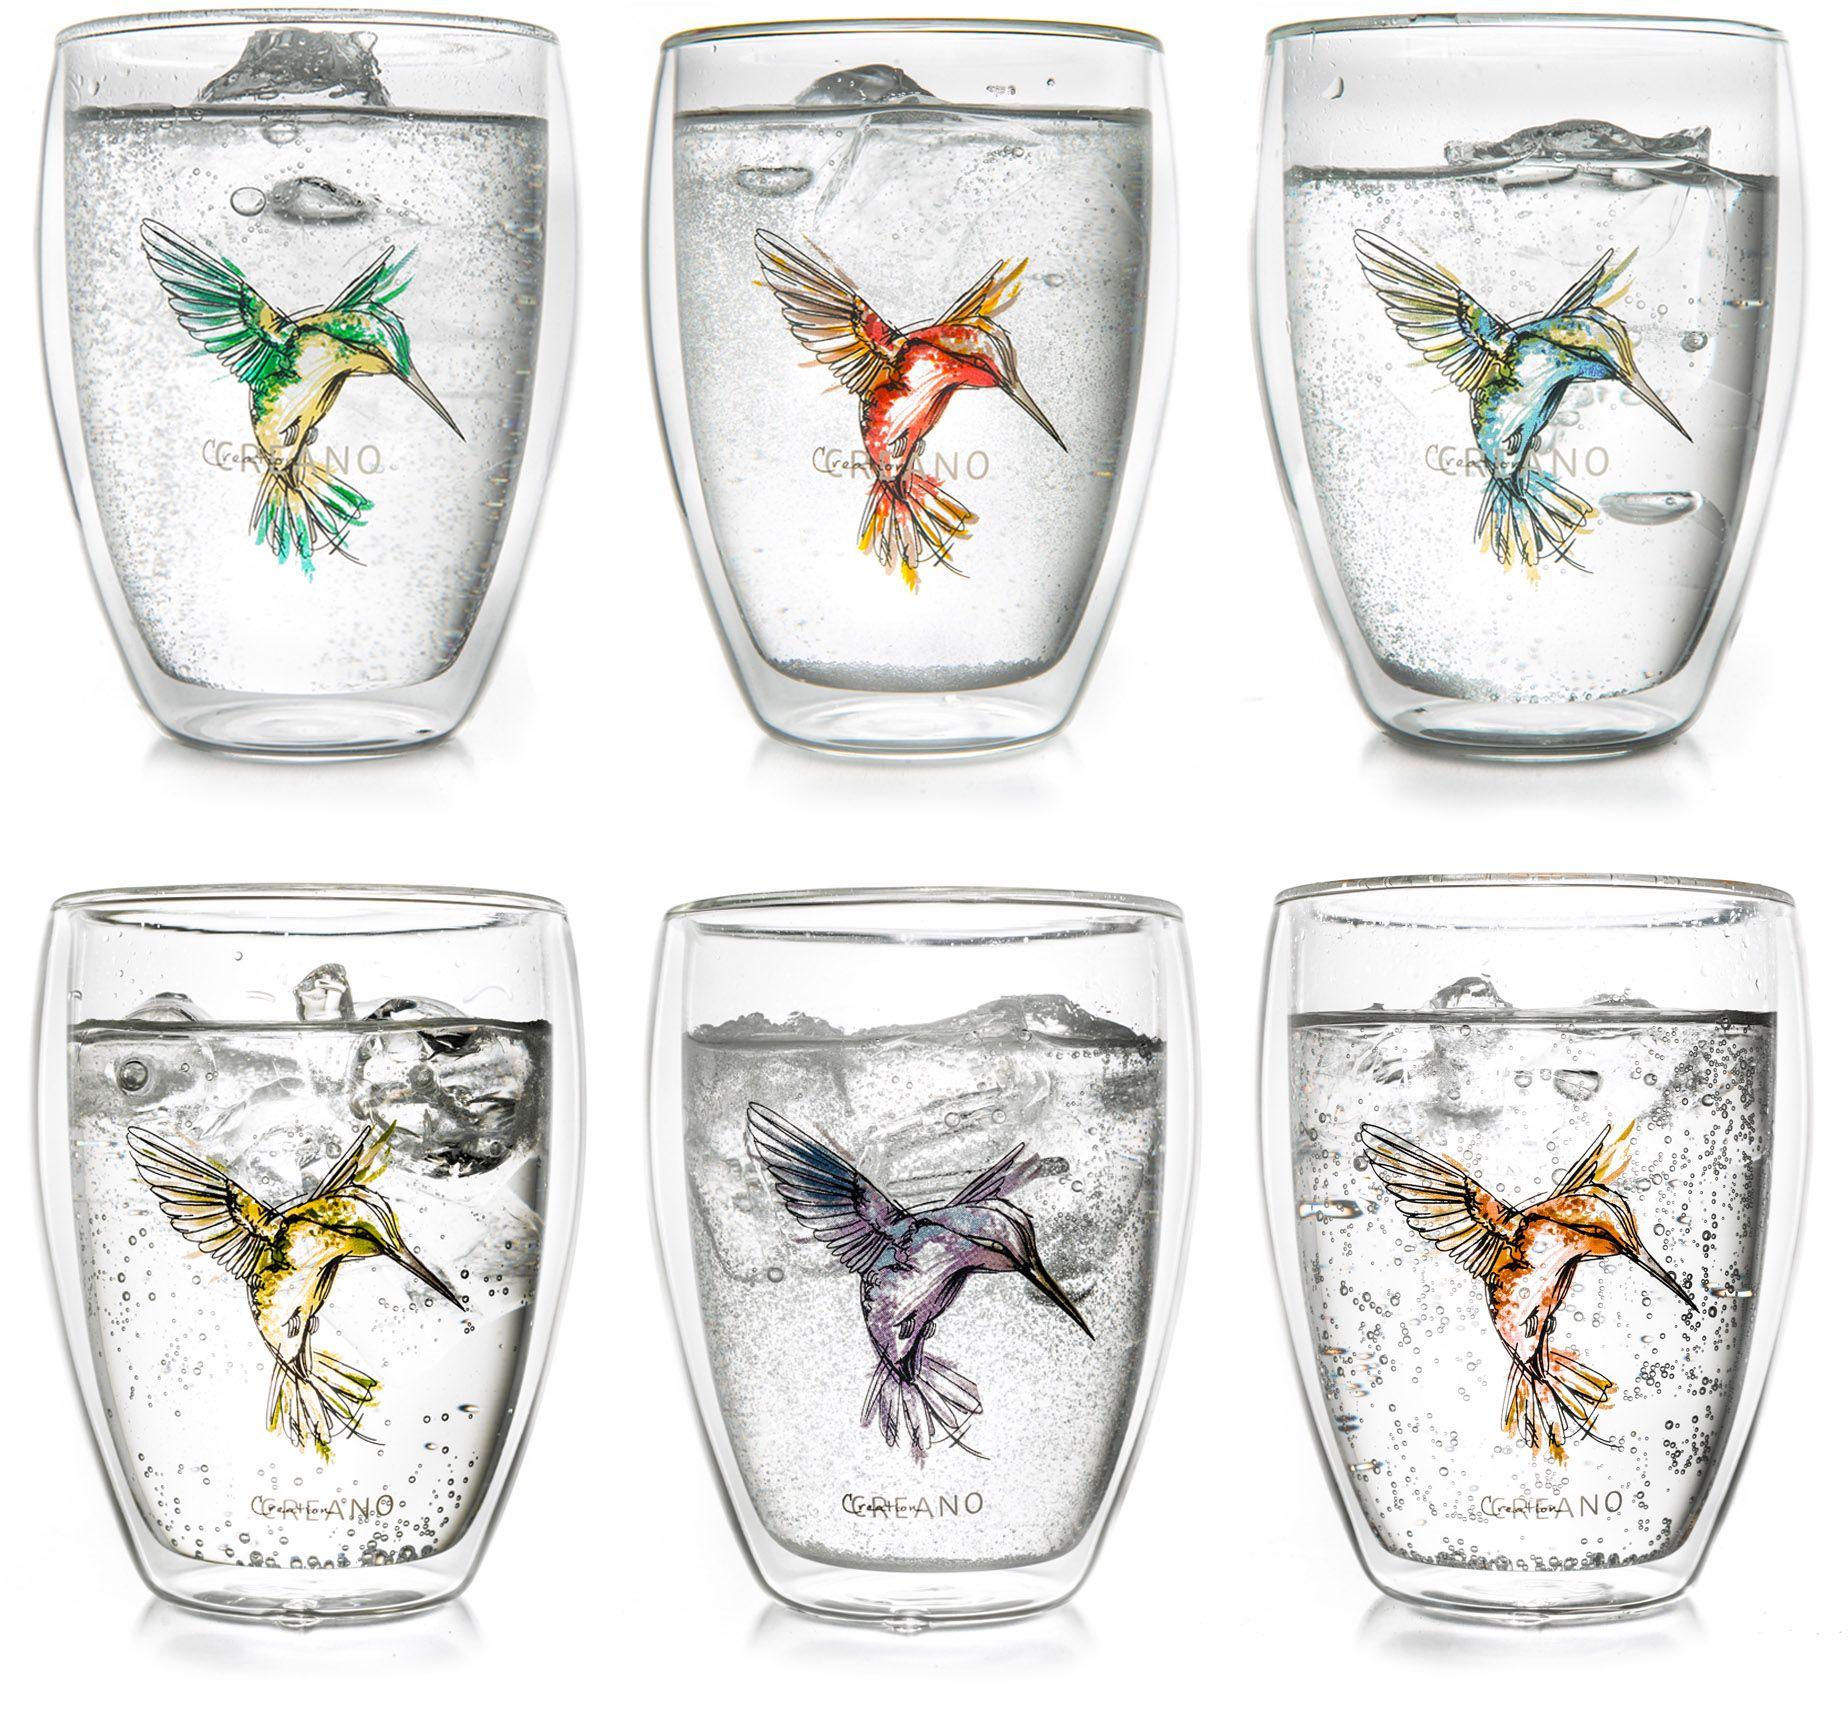 CREANO Creano Thermo-Glas, 6-er Set, doppelwandiges Tee-Glas, Latte Macchiato Glas, »Hummi«